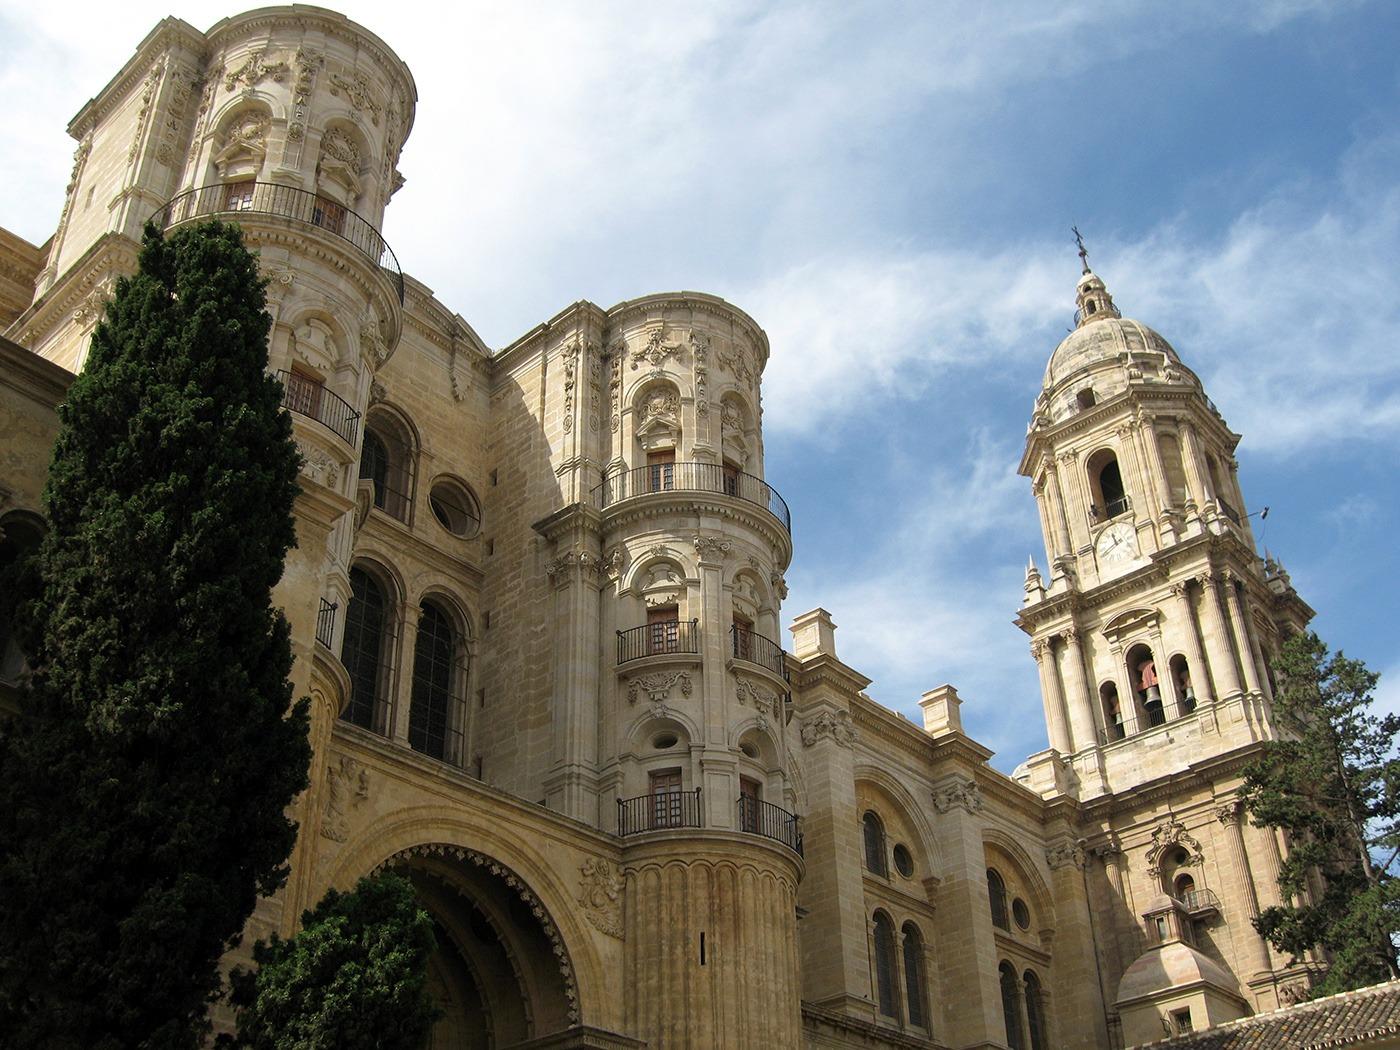 Descuento de pagarés en Málaga